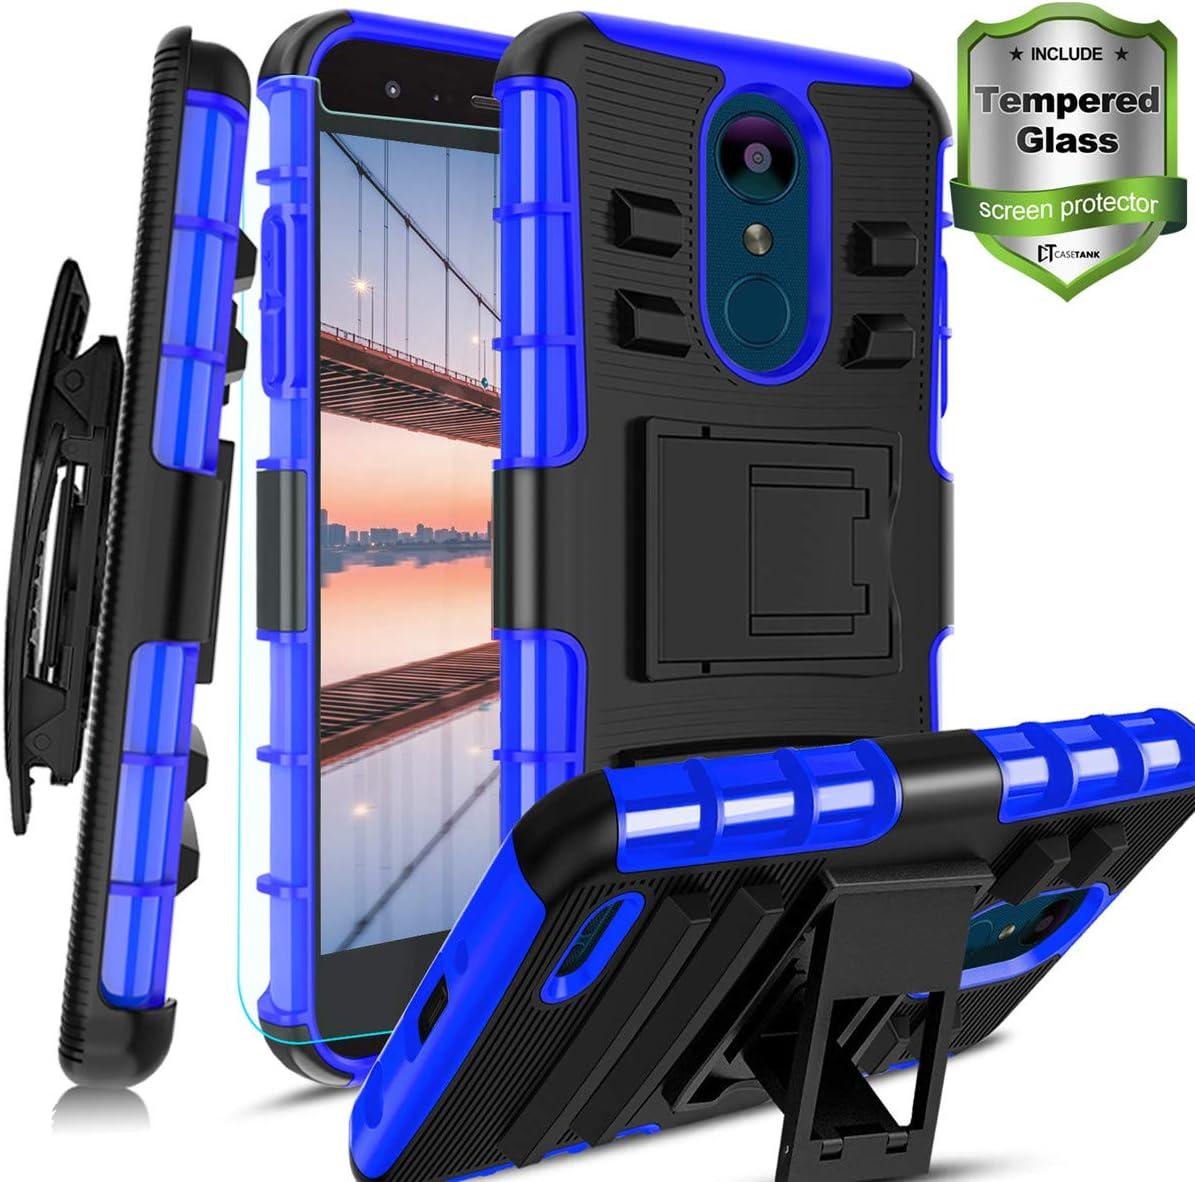 LG Aristo 2/LG Rebel 4 Case/Aristo 2 Plus/Phoenix 4/Zone 4/K8(2018)/Fortune 2/Risio 3/Tribute Dynasty/K8+/Rebel 4 LTE W [Tempered Glass Screen Protector] Built-in Kickstand Belt Clip Holster, Blue